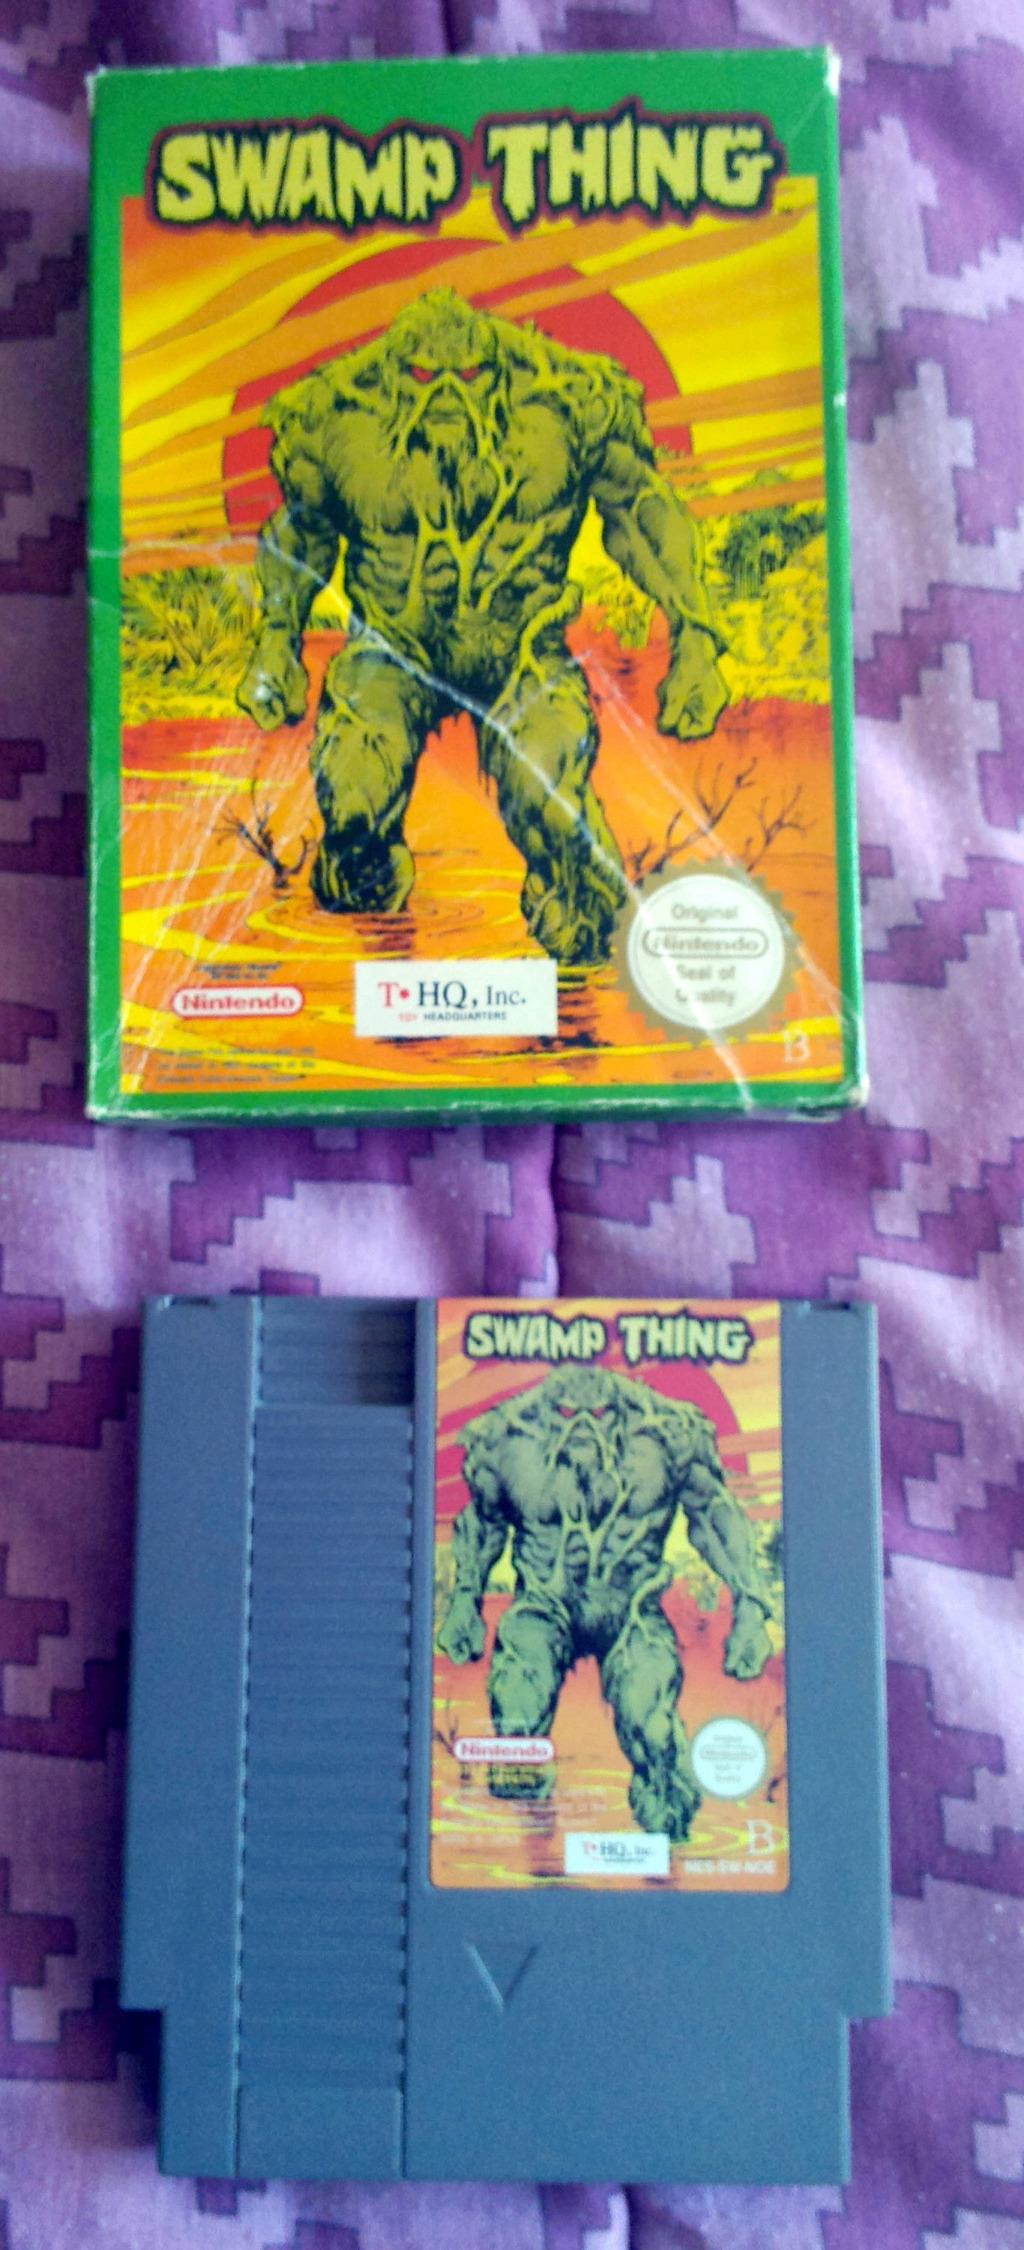 [Estim] 4 MVS, 6 jeux NES, Last Ninja C64 St10